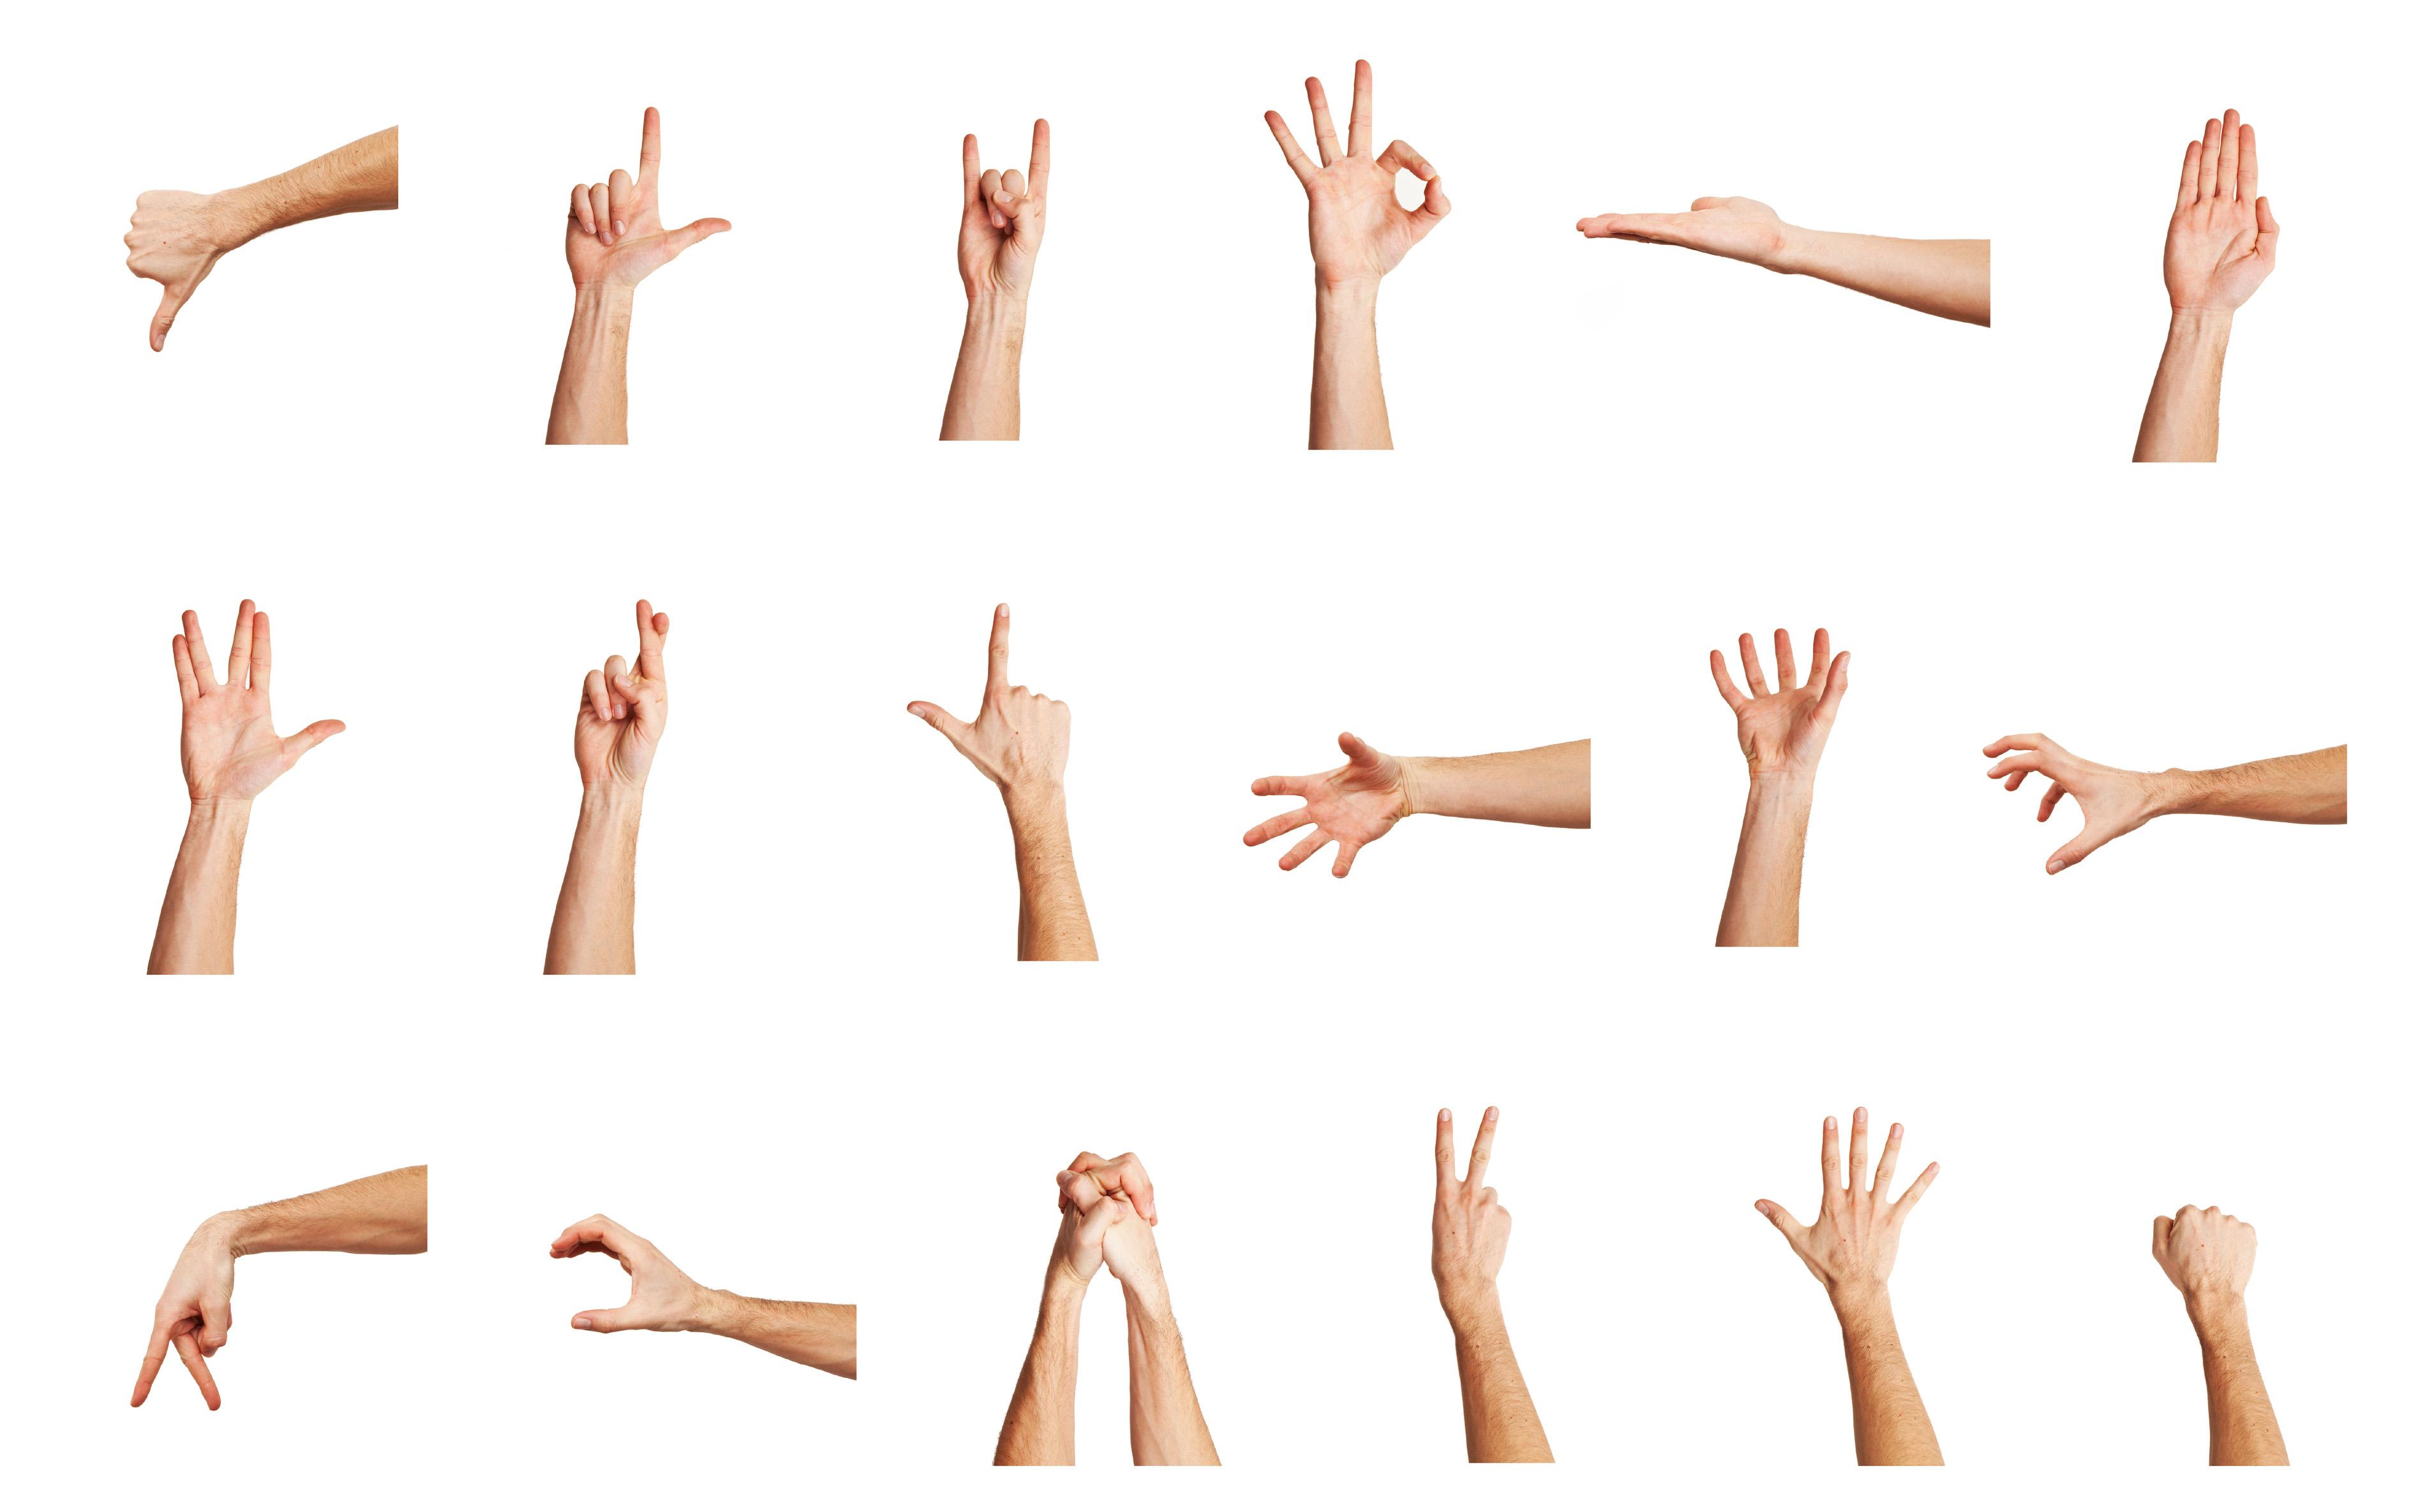 Hand Gesture #8